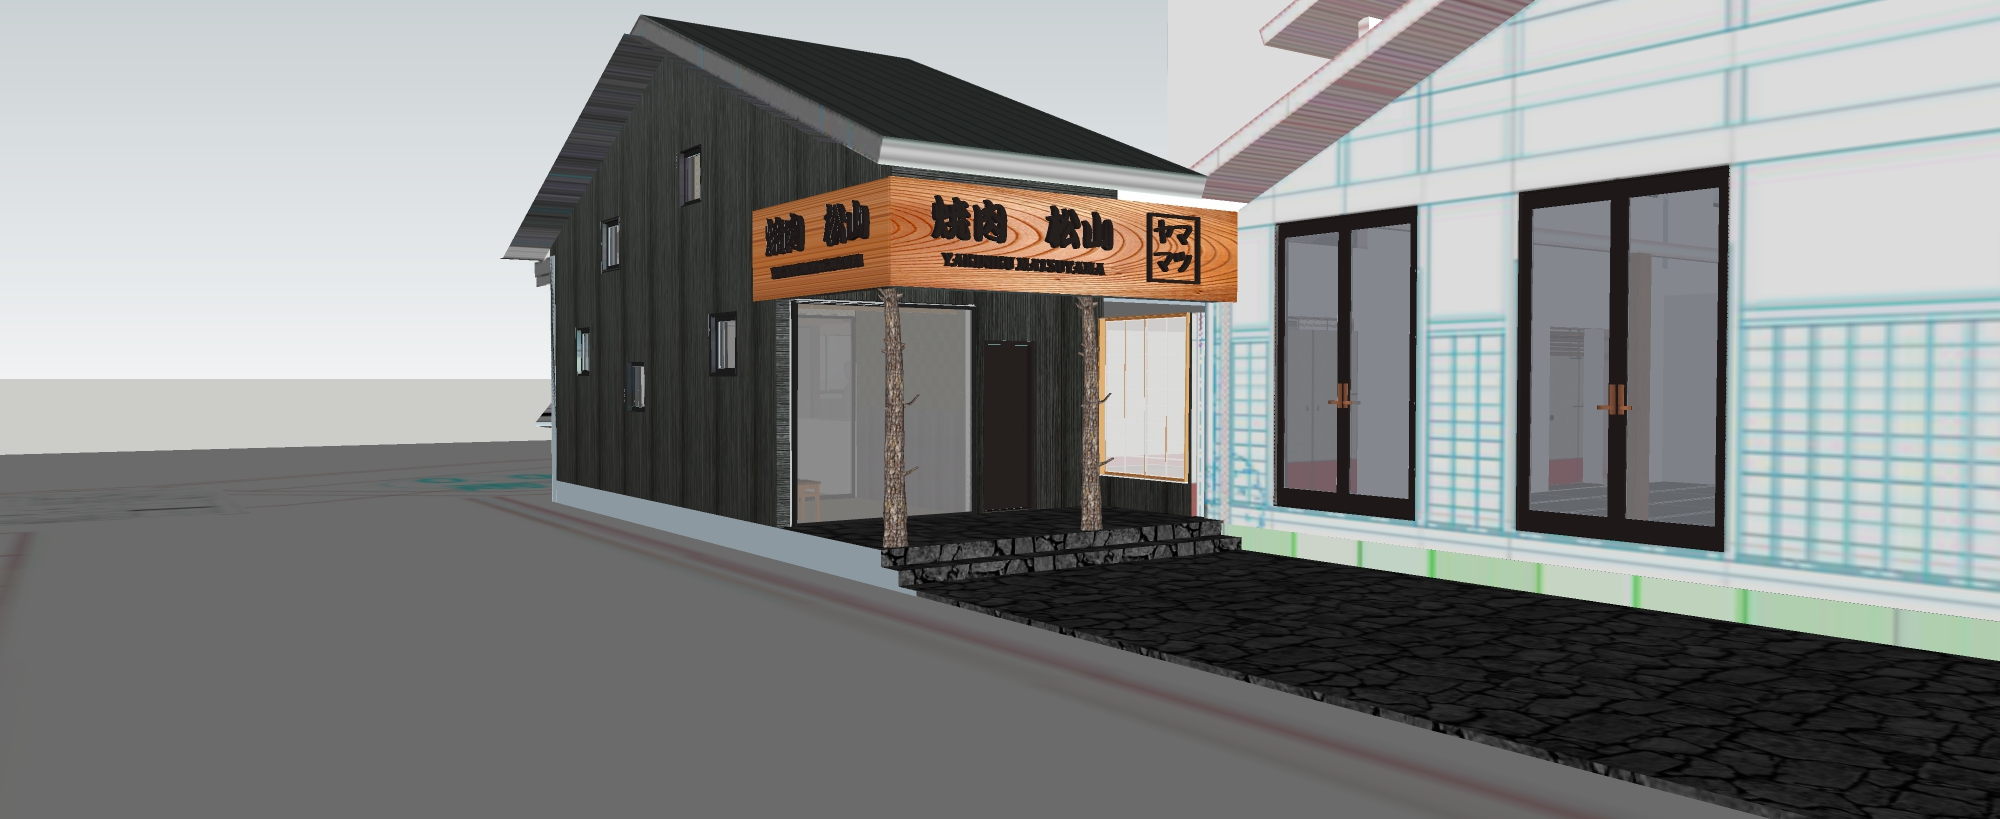 170811-goryu-3D-焼肉ハウス-仕上-レストラン入口